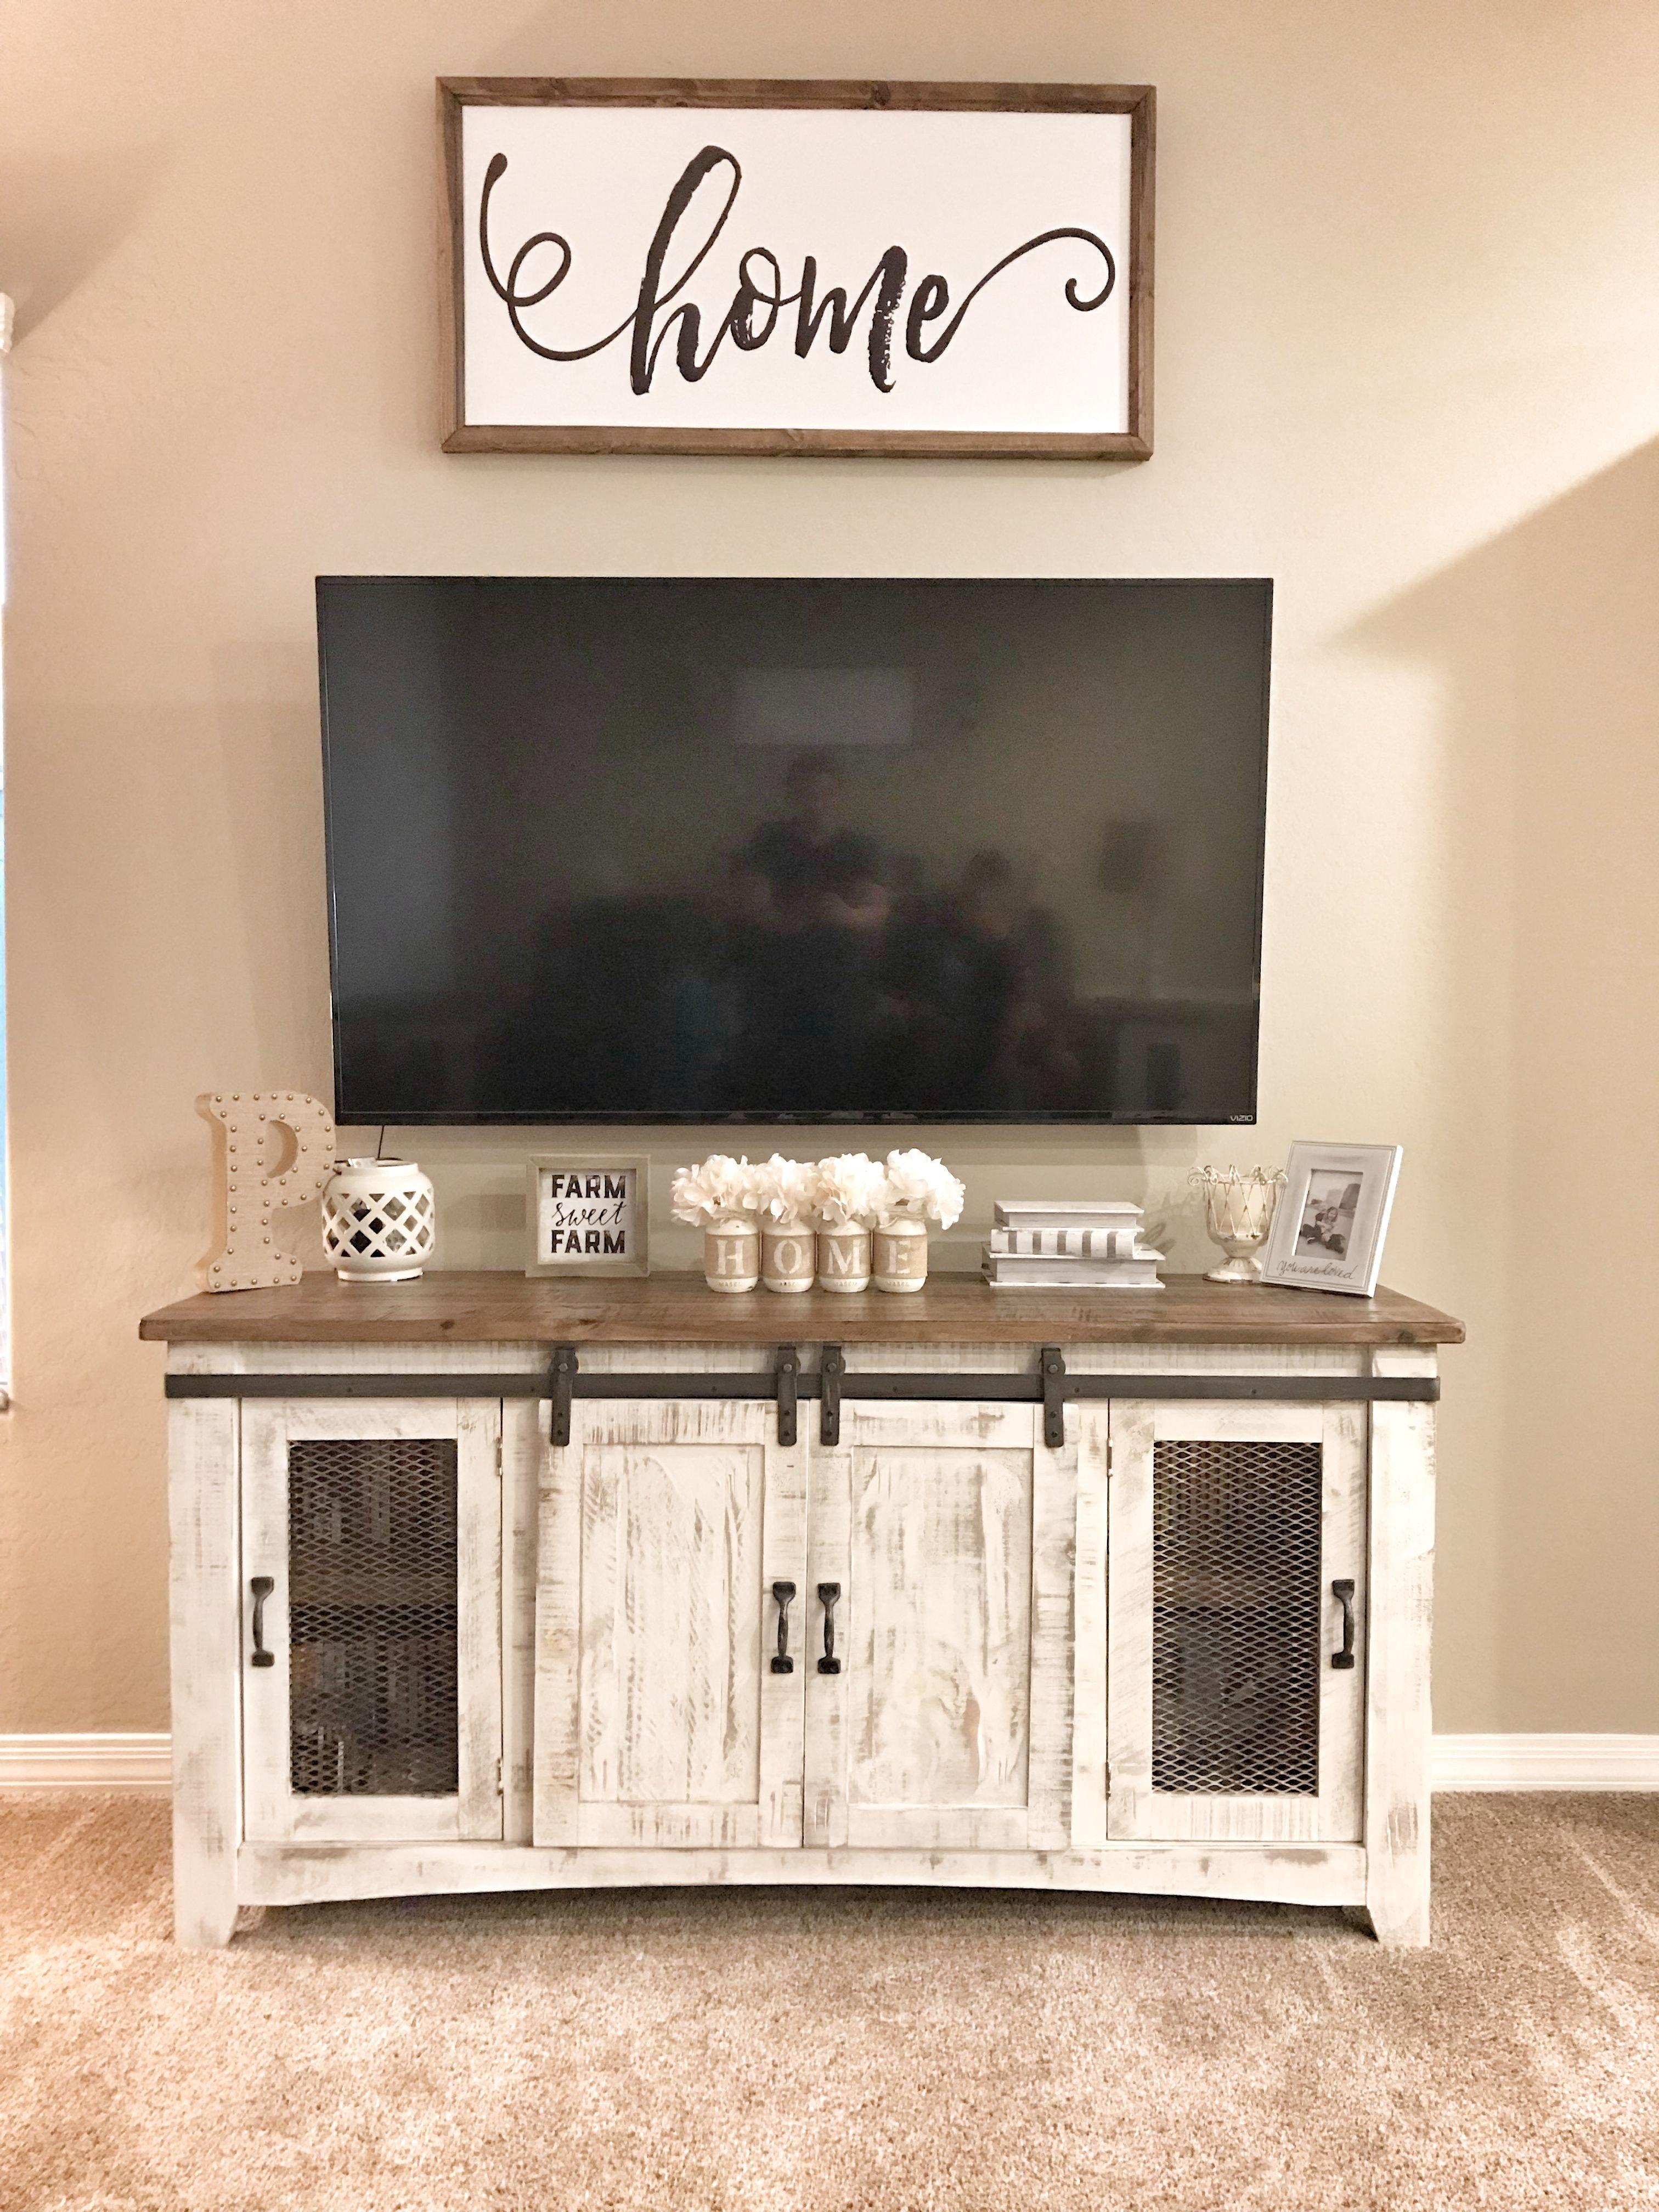 Farmhouse Tv Stand Design Ideas and Decor New Farmhouse Tv Stand Tv Stand Decor Media Stand Decor New Home Decor